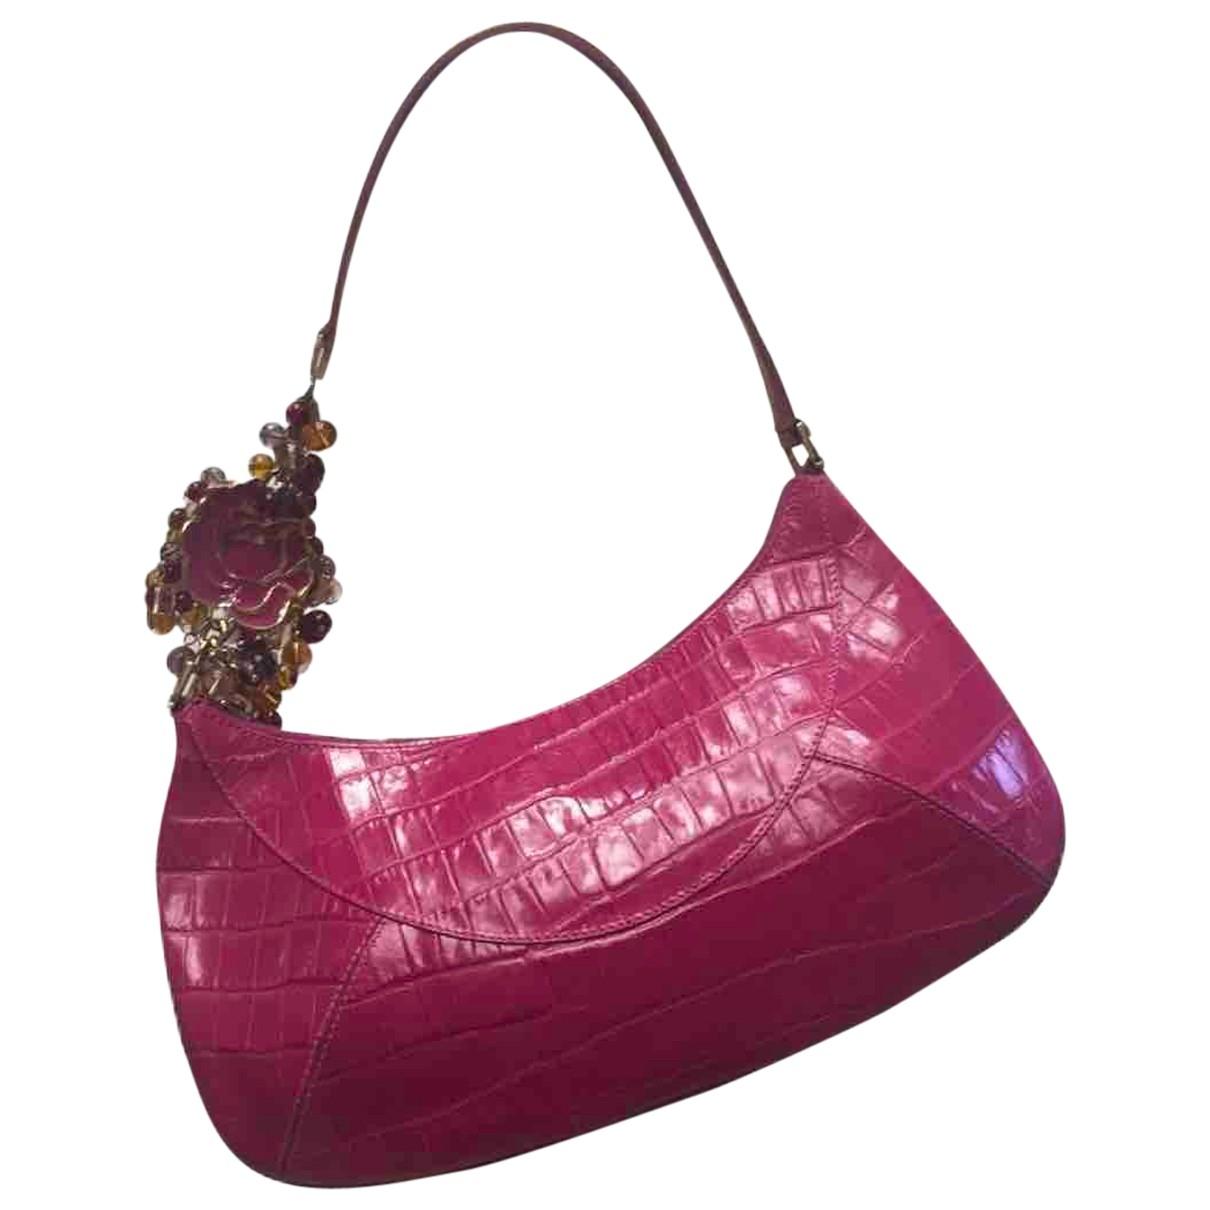 Gianni Versace - Sac a main   pour femme en cuir - rose